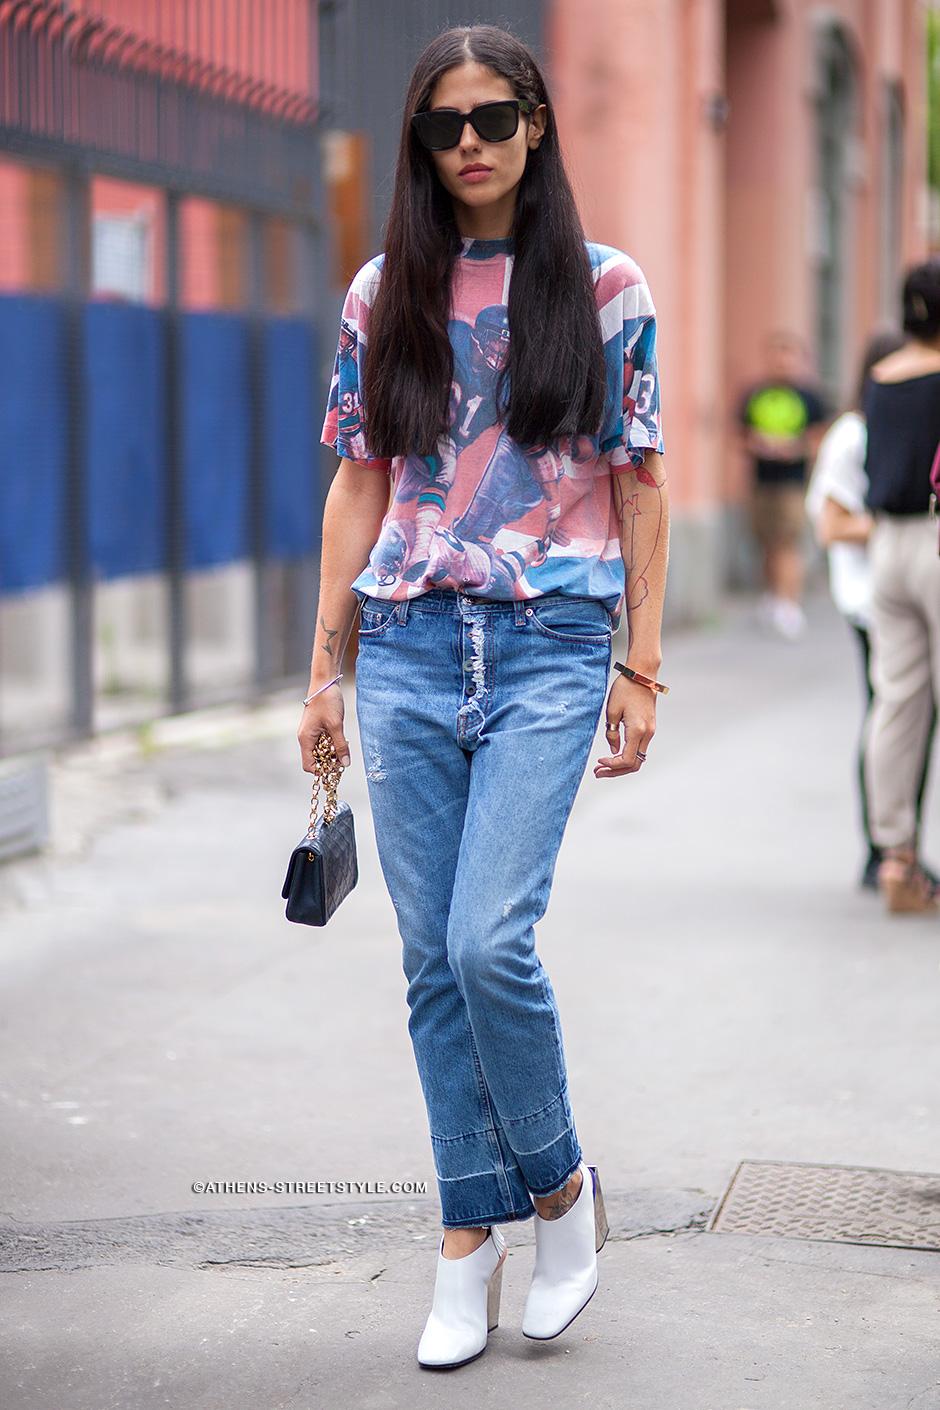 Gilda Ambrosio Style Icon Vlist 38